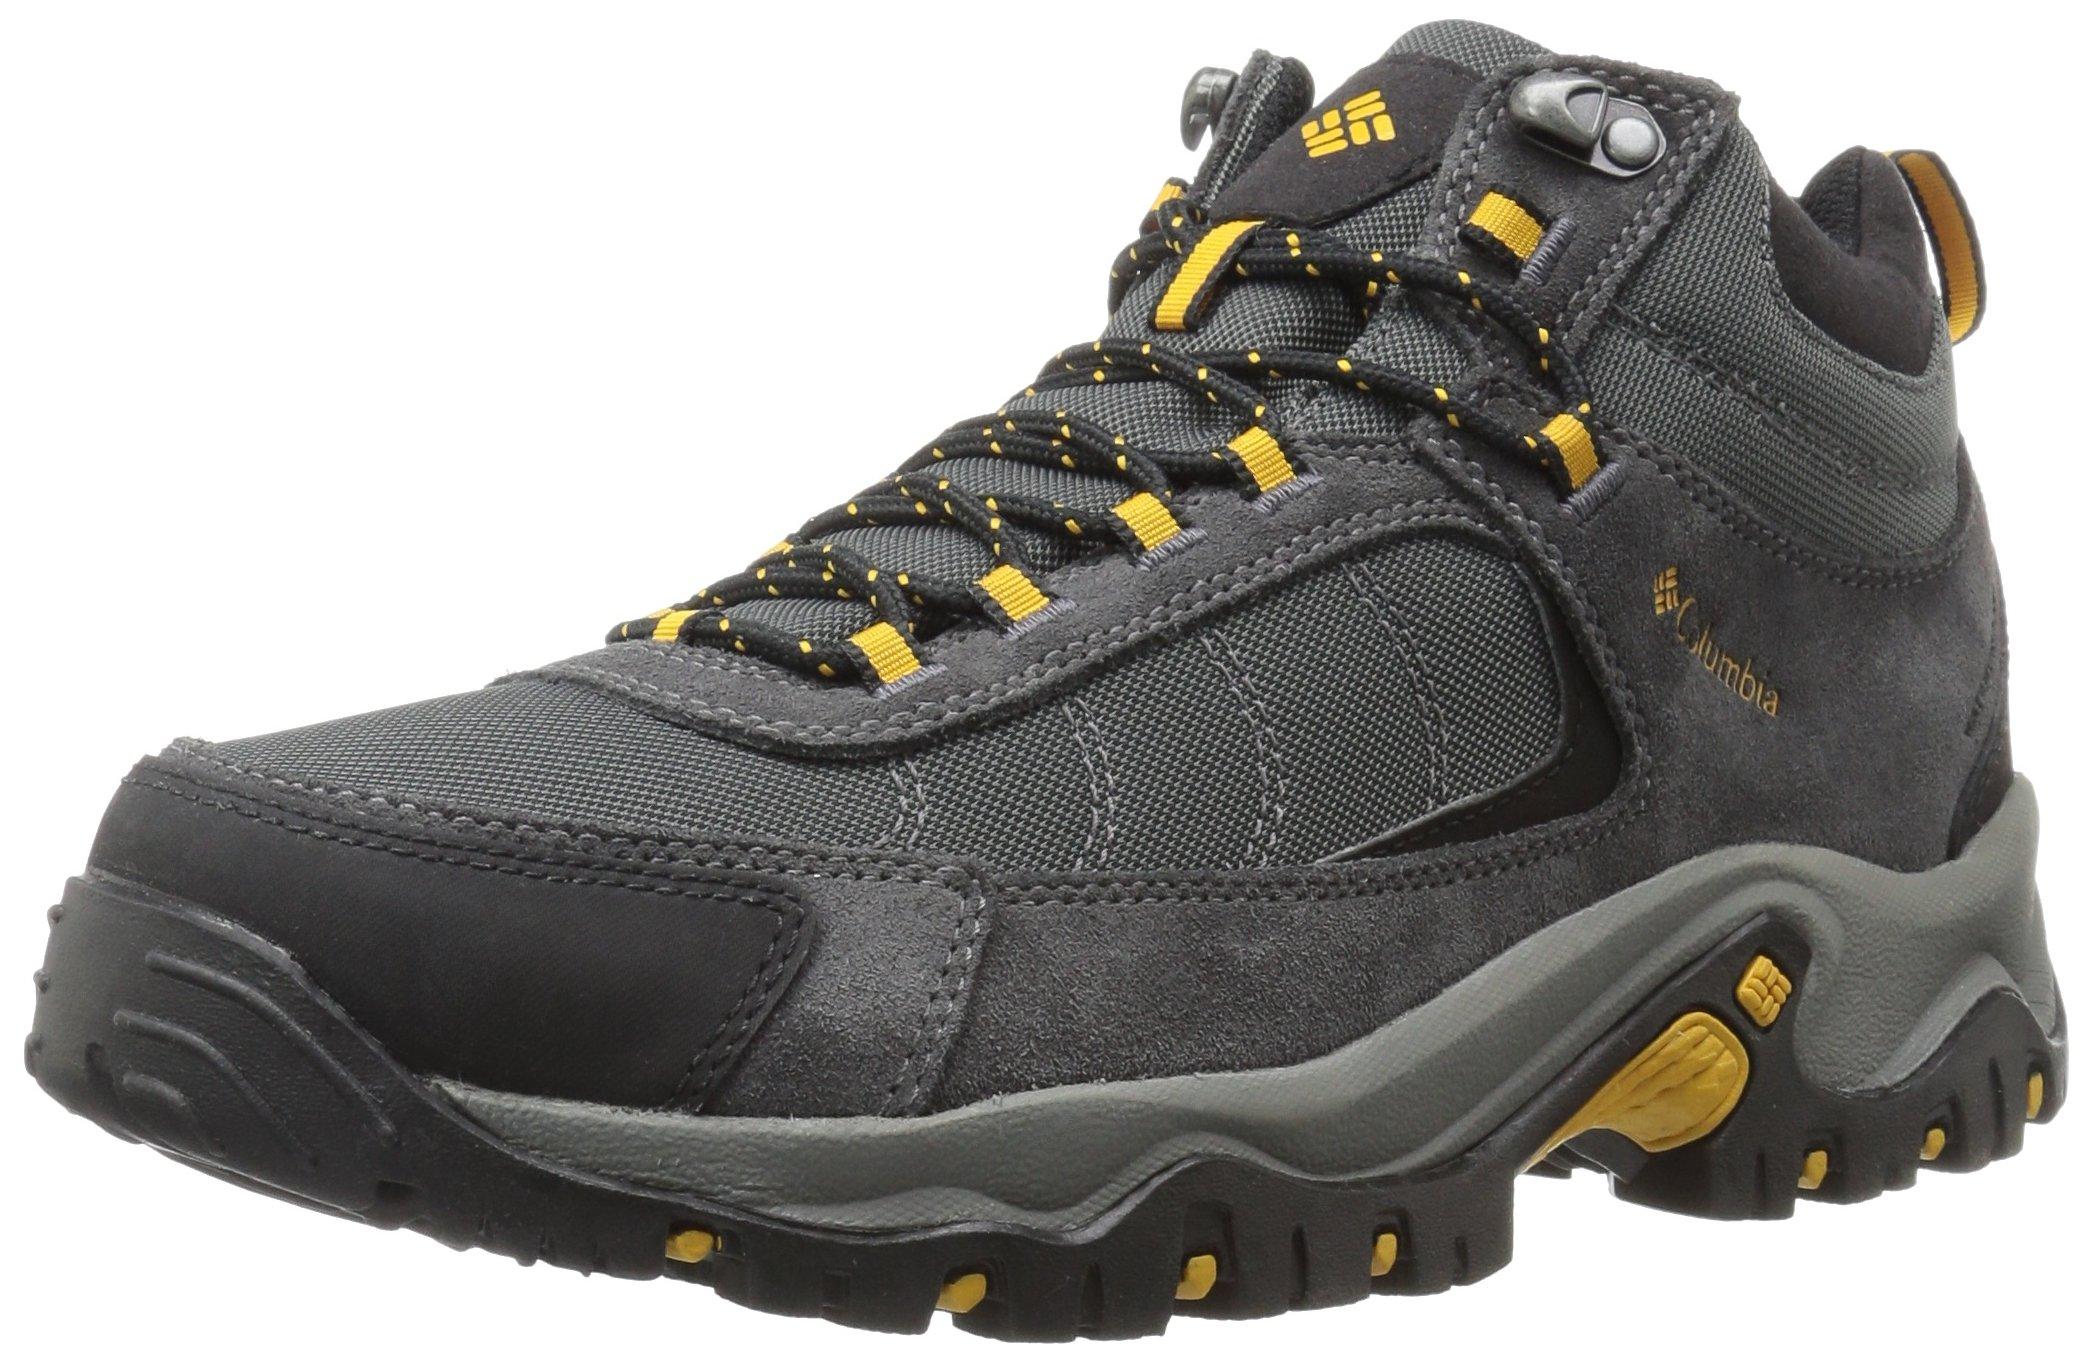 Columbia Men's Granite Ridge MID Waterproof Hiking Shoe, Dark Grey, Golden Yellow, 13 D US by Columbia